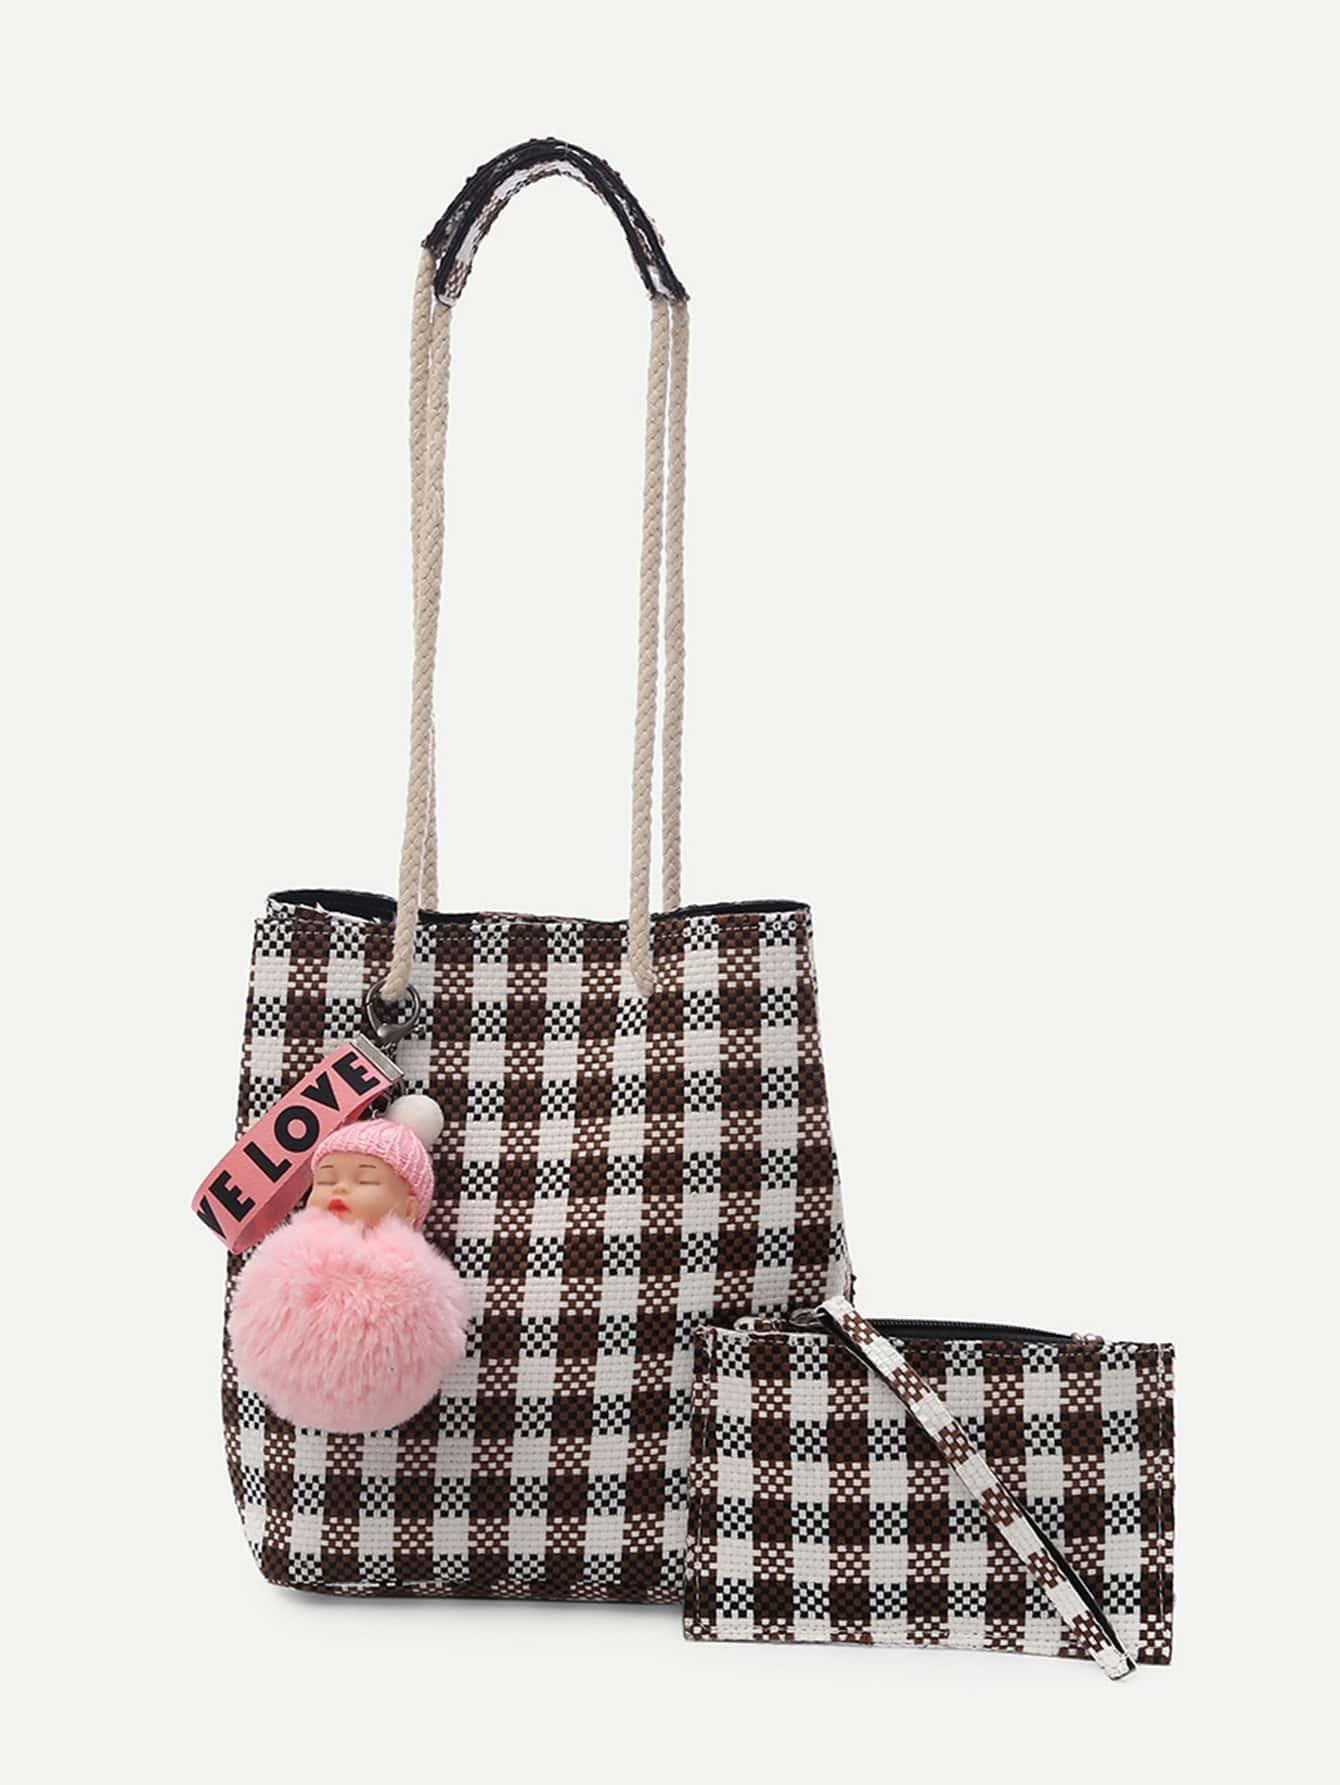 Charm Detail Gingham Shoulder Bag With Clutch patch detail combination bag with clutch bag